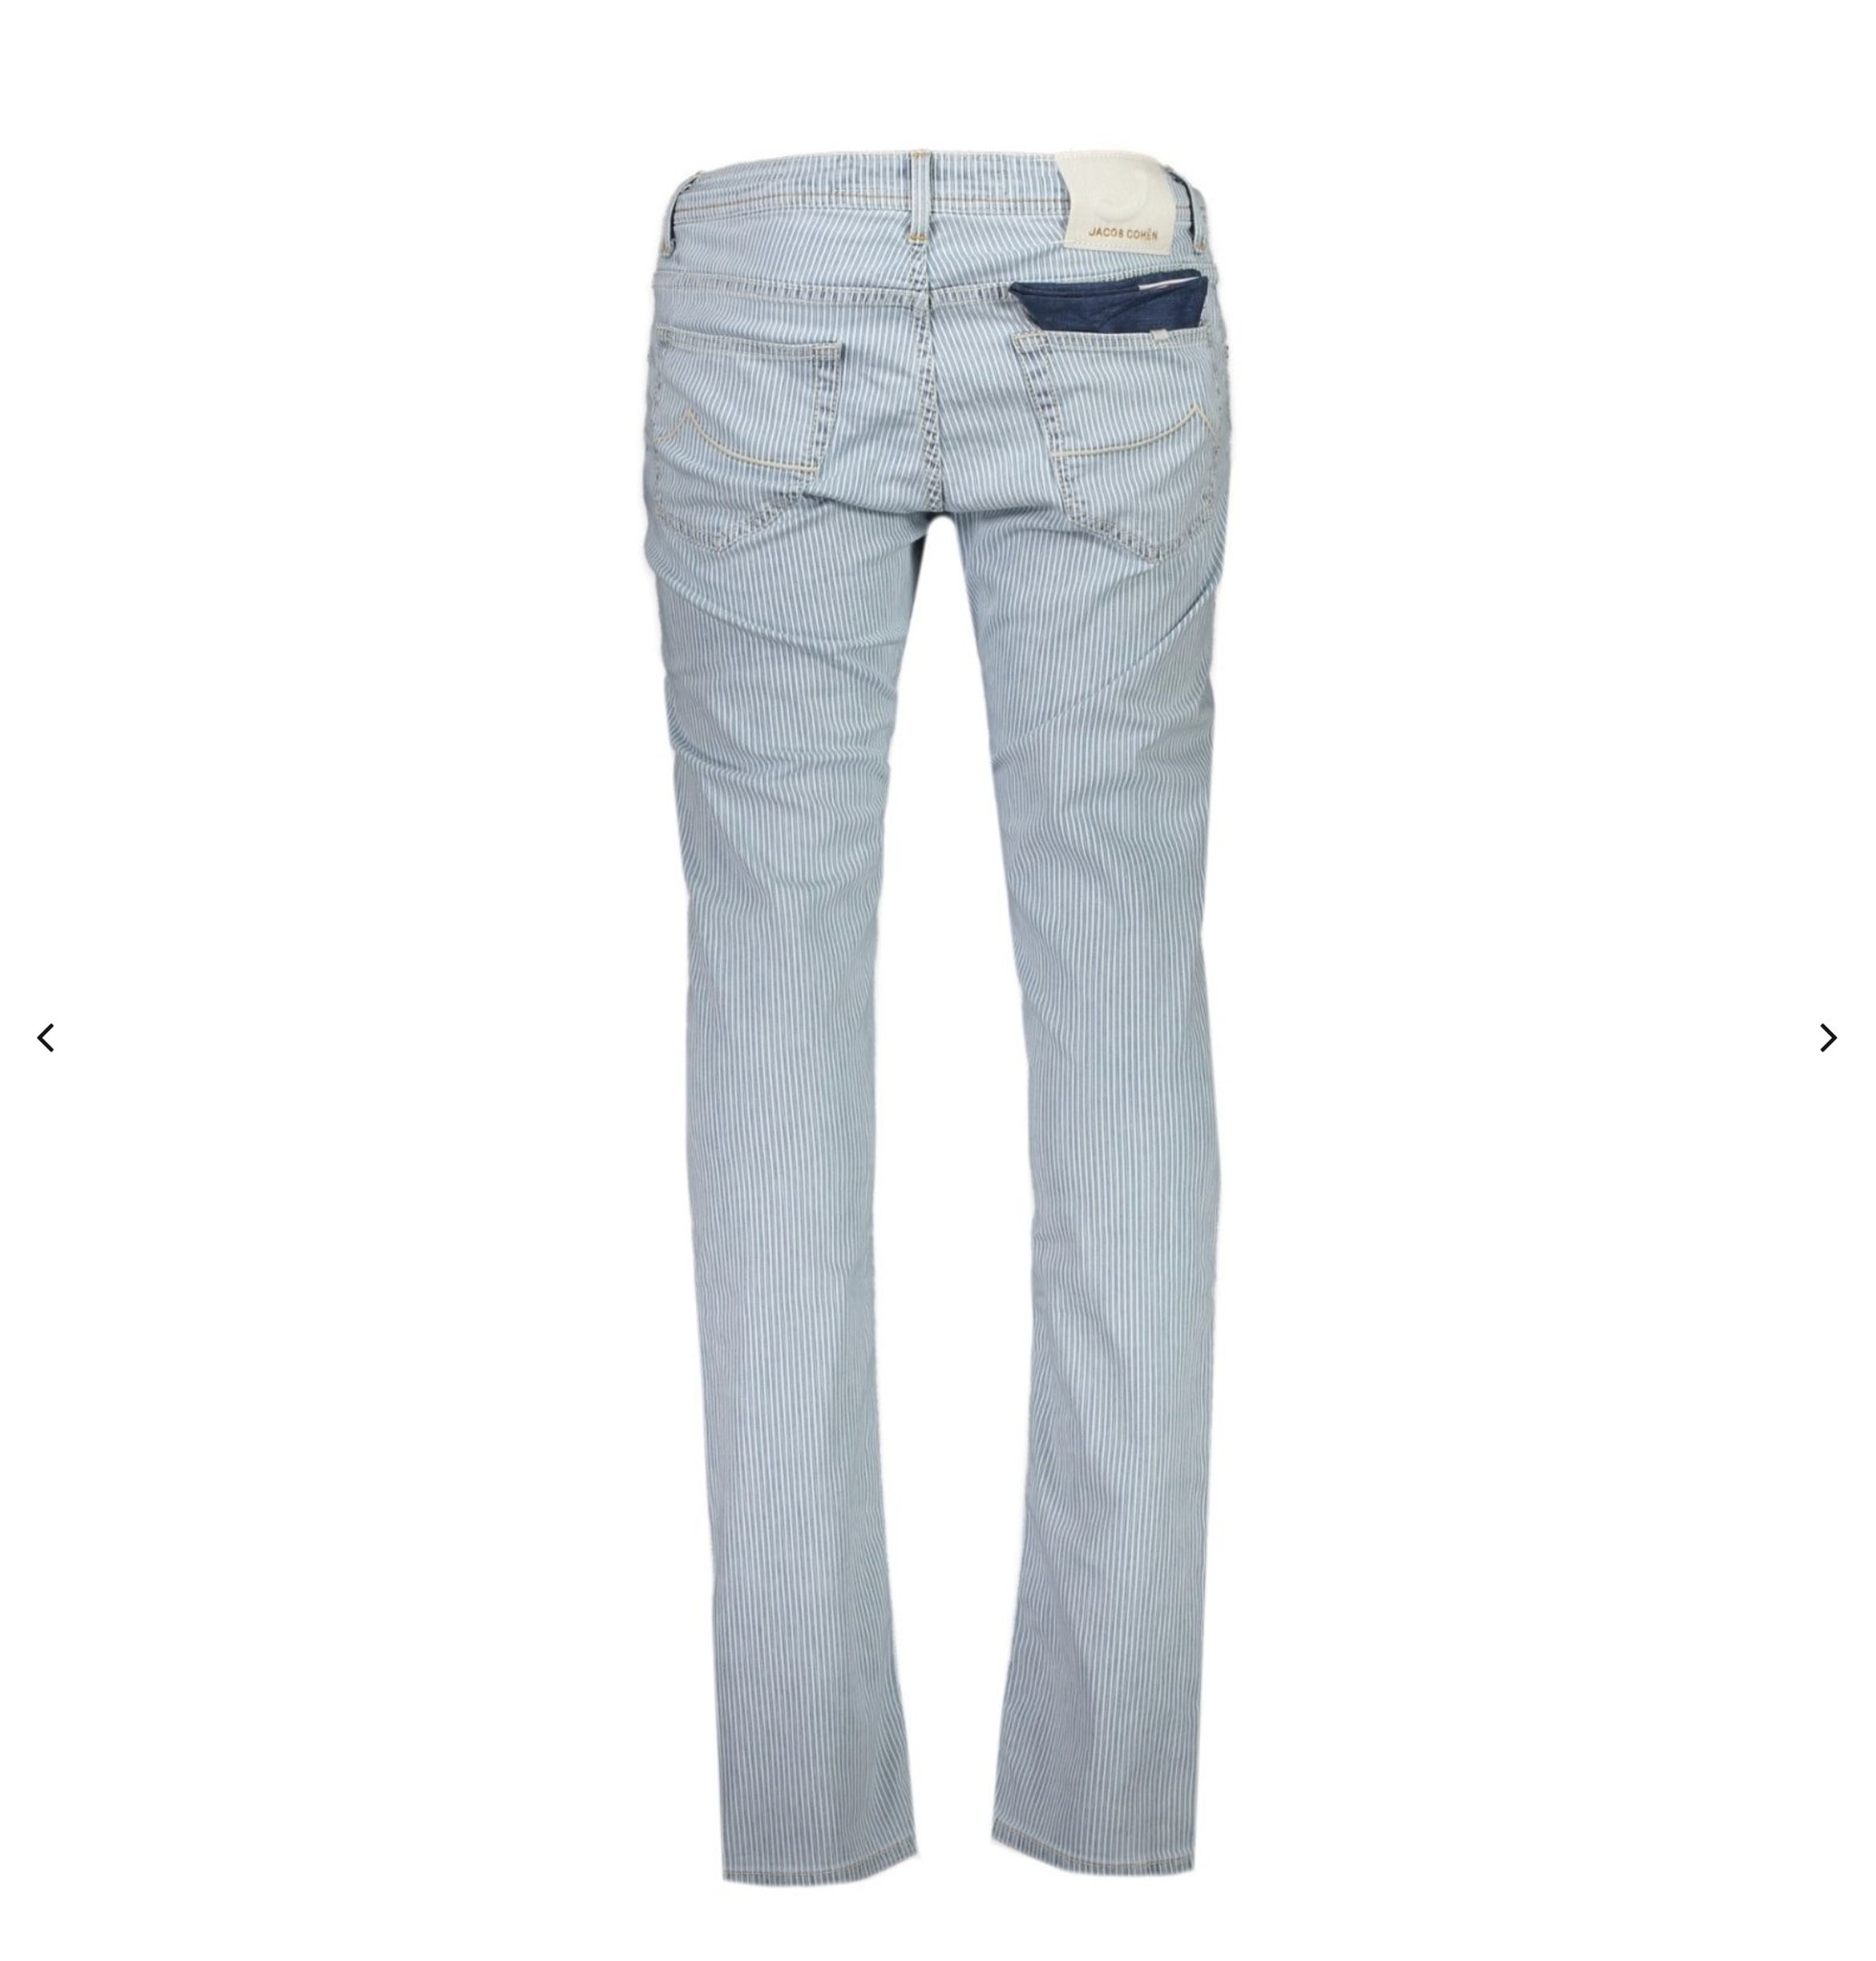 J622 Comf Jeans-2